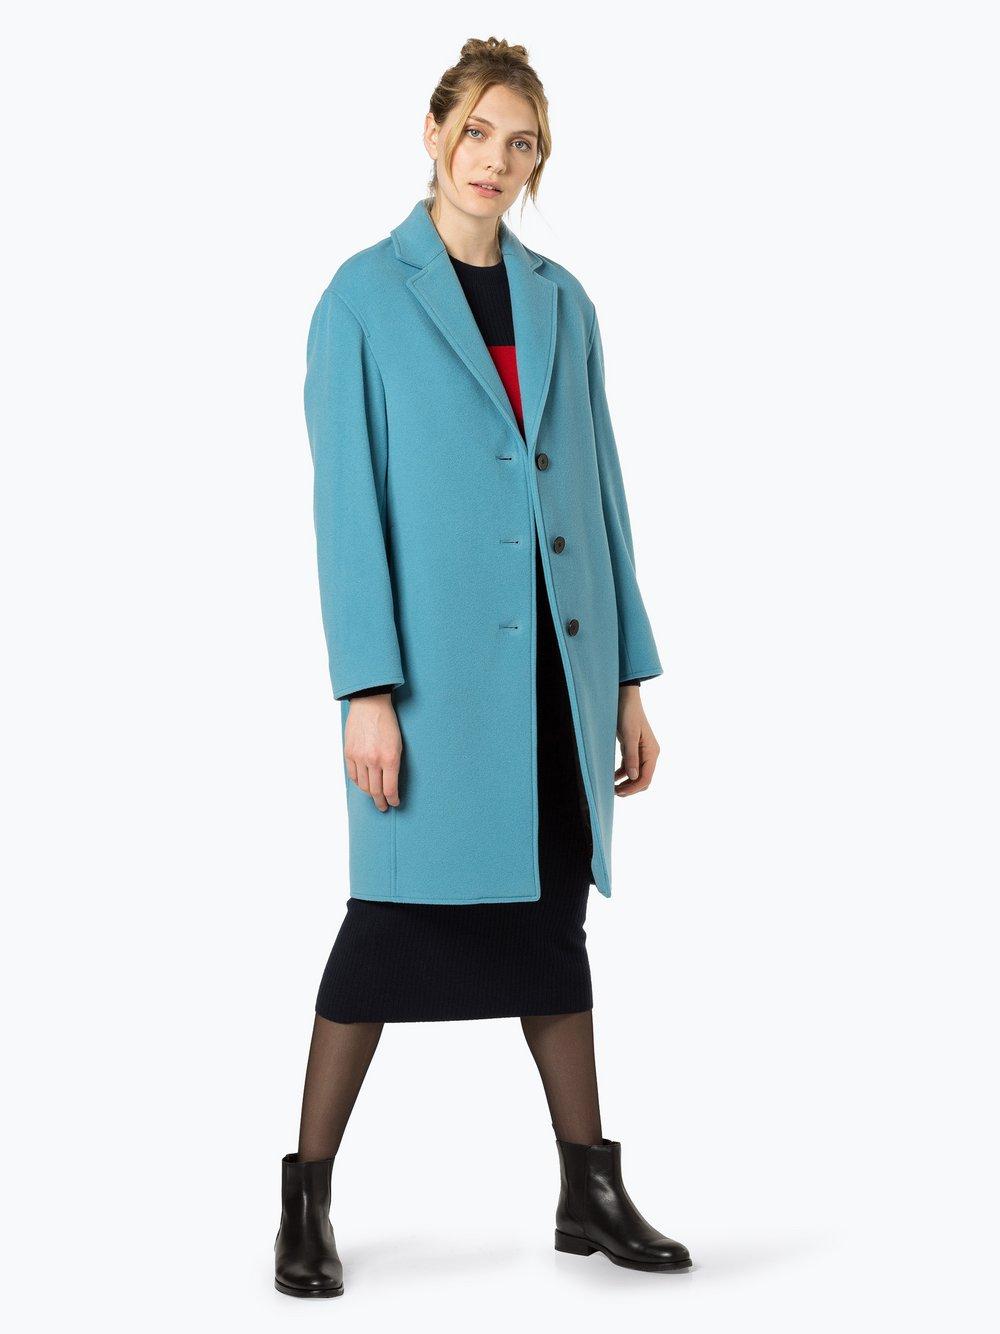 new style 14913 dc7a3 Calvin Klein Damen Mantel online kaufen | VANGRAAF.COM